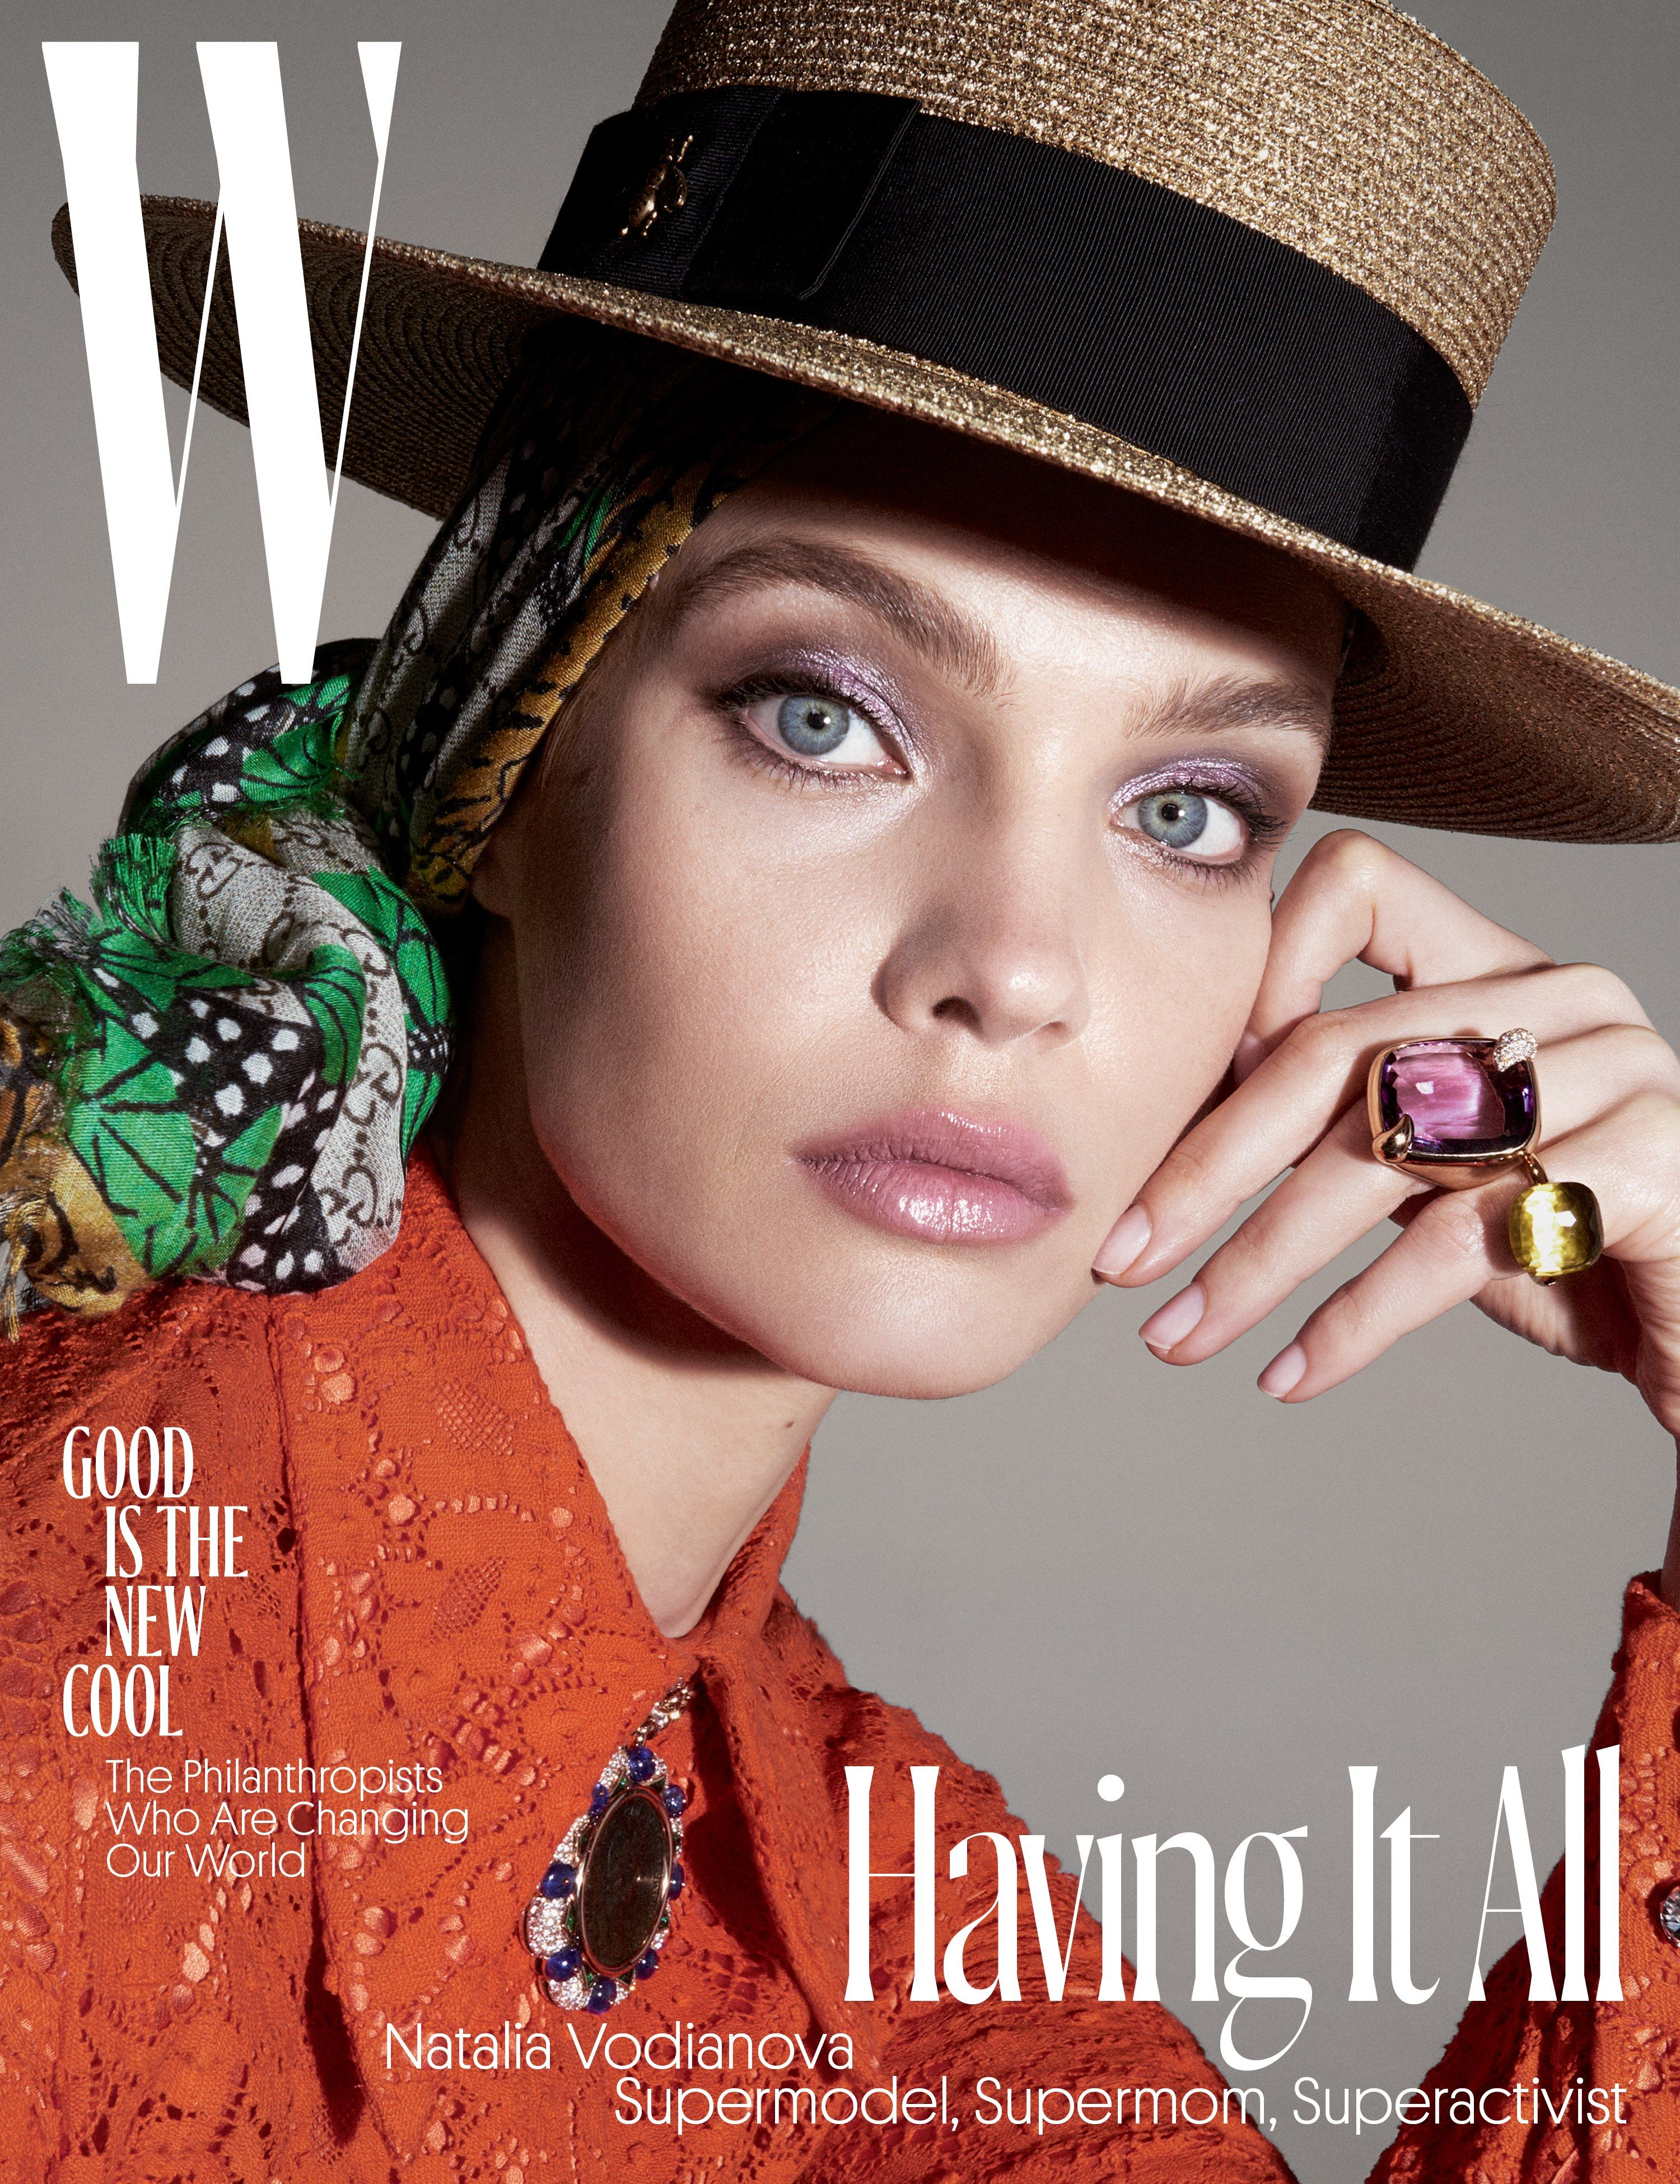 c3e84d4f767bb Natalia Vodianova, W s June July 2017 Cover Star, Poses for Photographer  Steven Meisel Photos   W Magazine